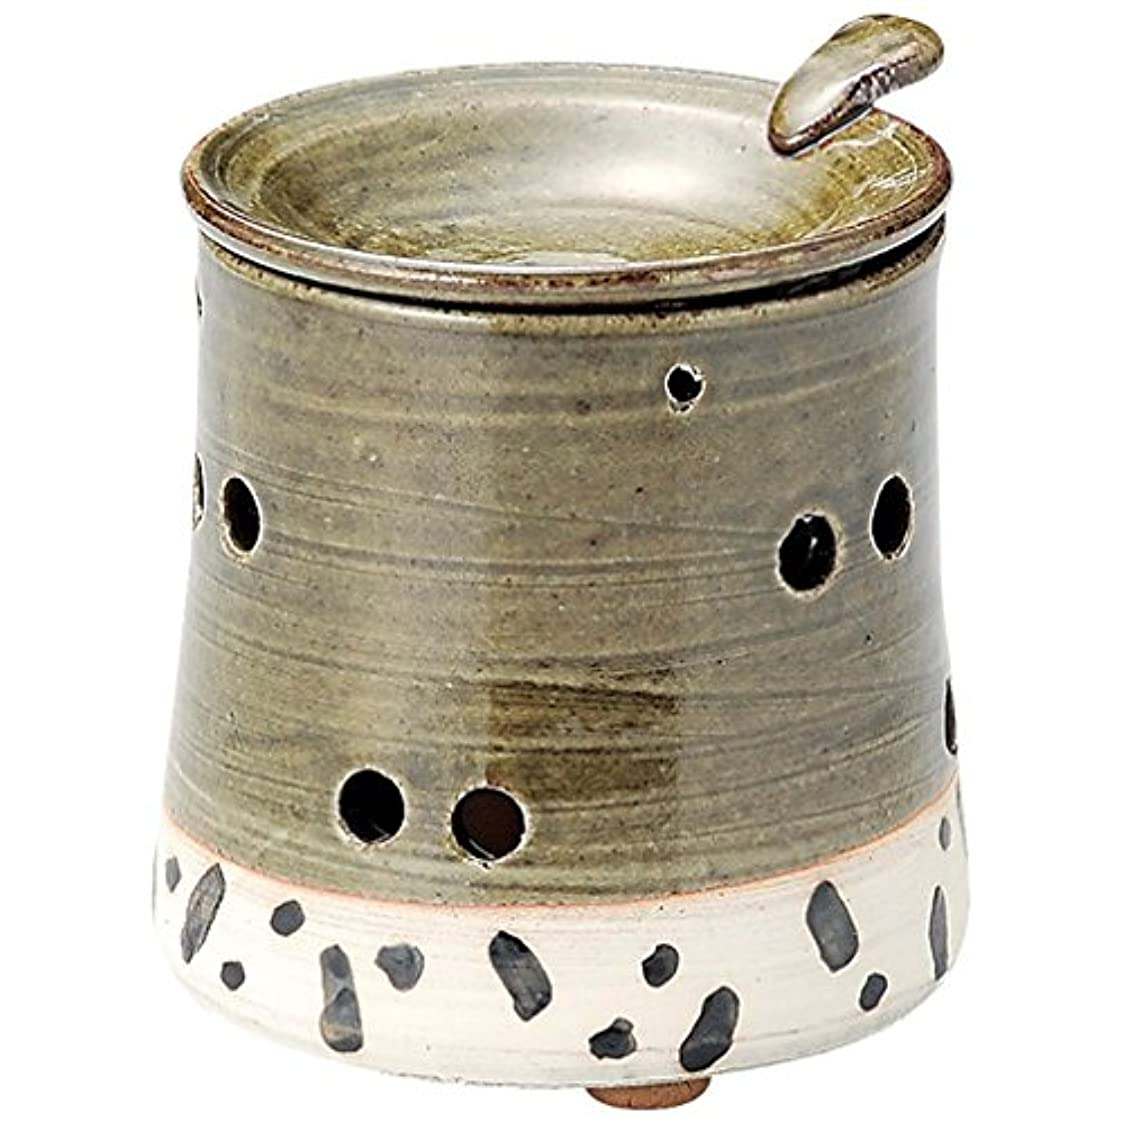 指令抑制する慈悲深い山下工芸 常滑焼 山田織部釉茶香炉 10×9.5×9.5cm 13045680